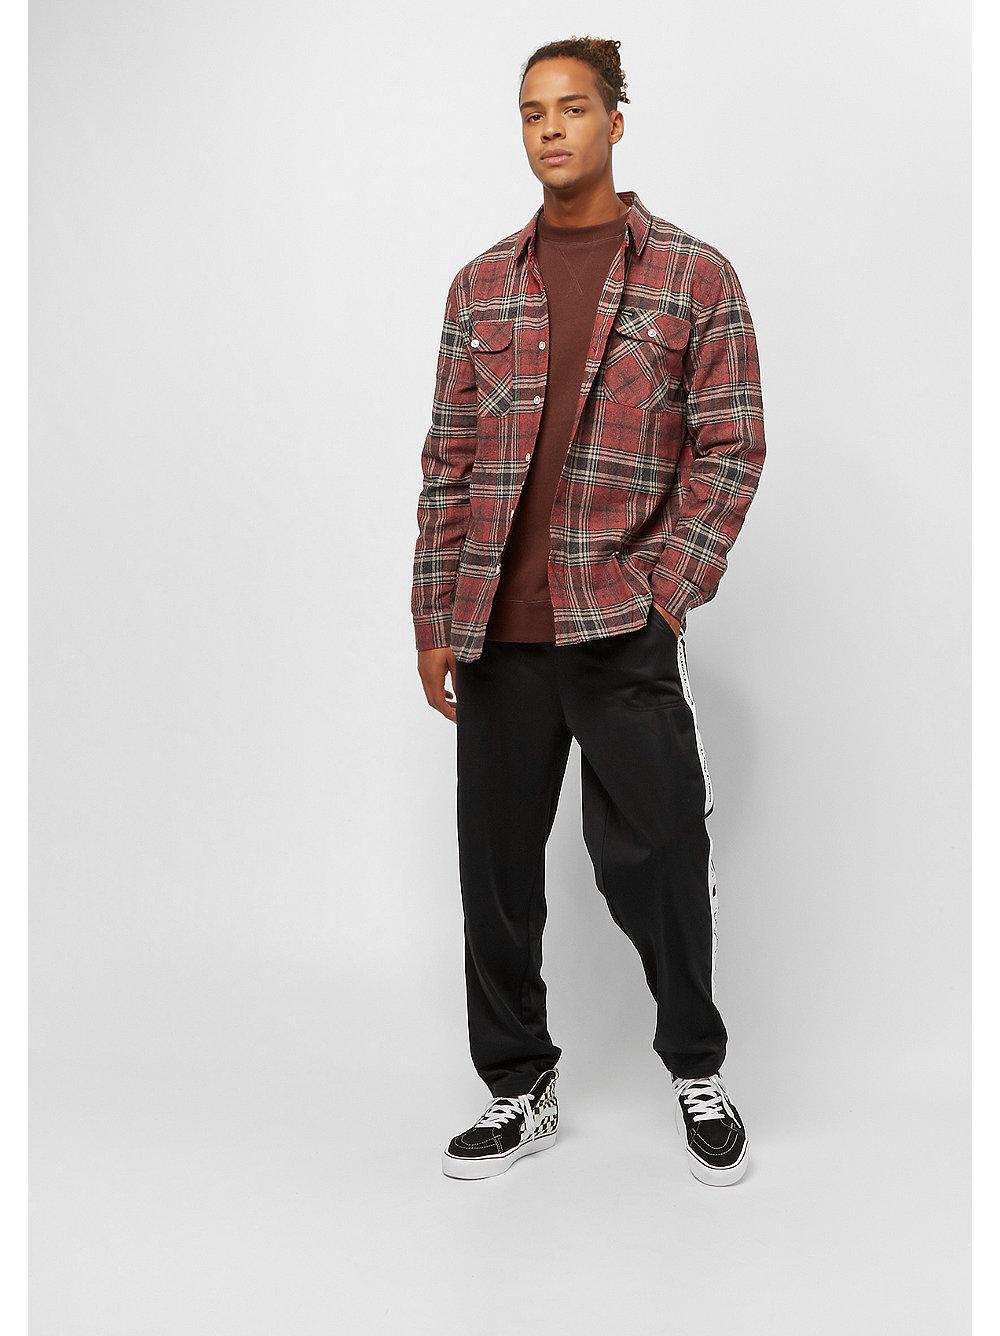 4dcc503c107ea Compra Brixton Bowery Flannel brick steel Camisas de manga larga en SNIPES